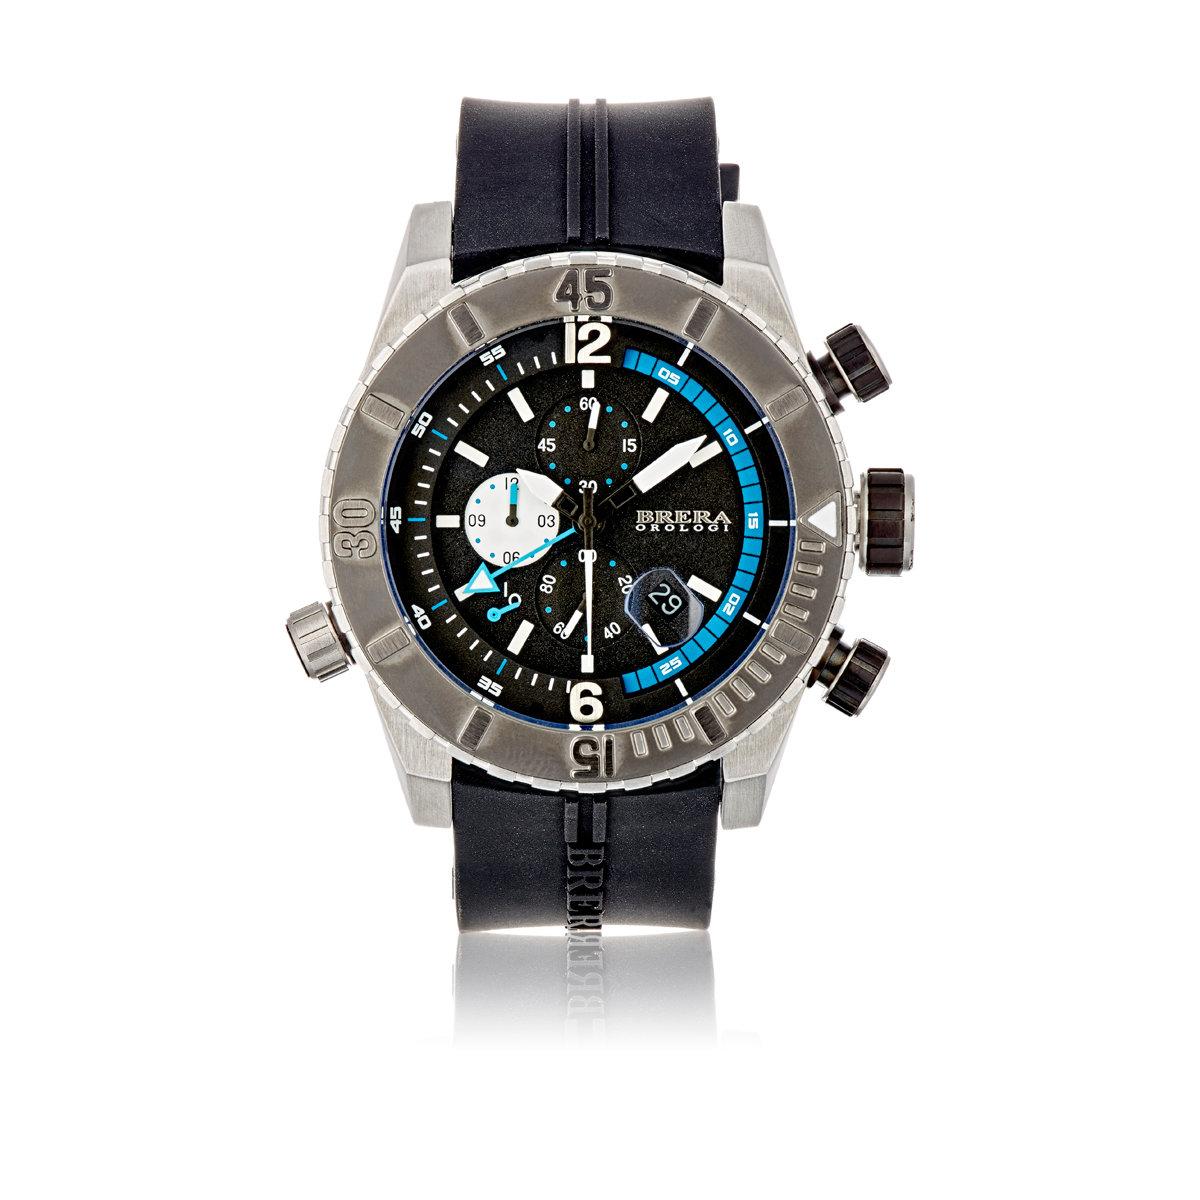 Lyst brera orologi men 39 s sottomarino diver watch in for Sottomarino italia